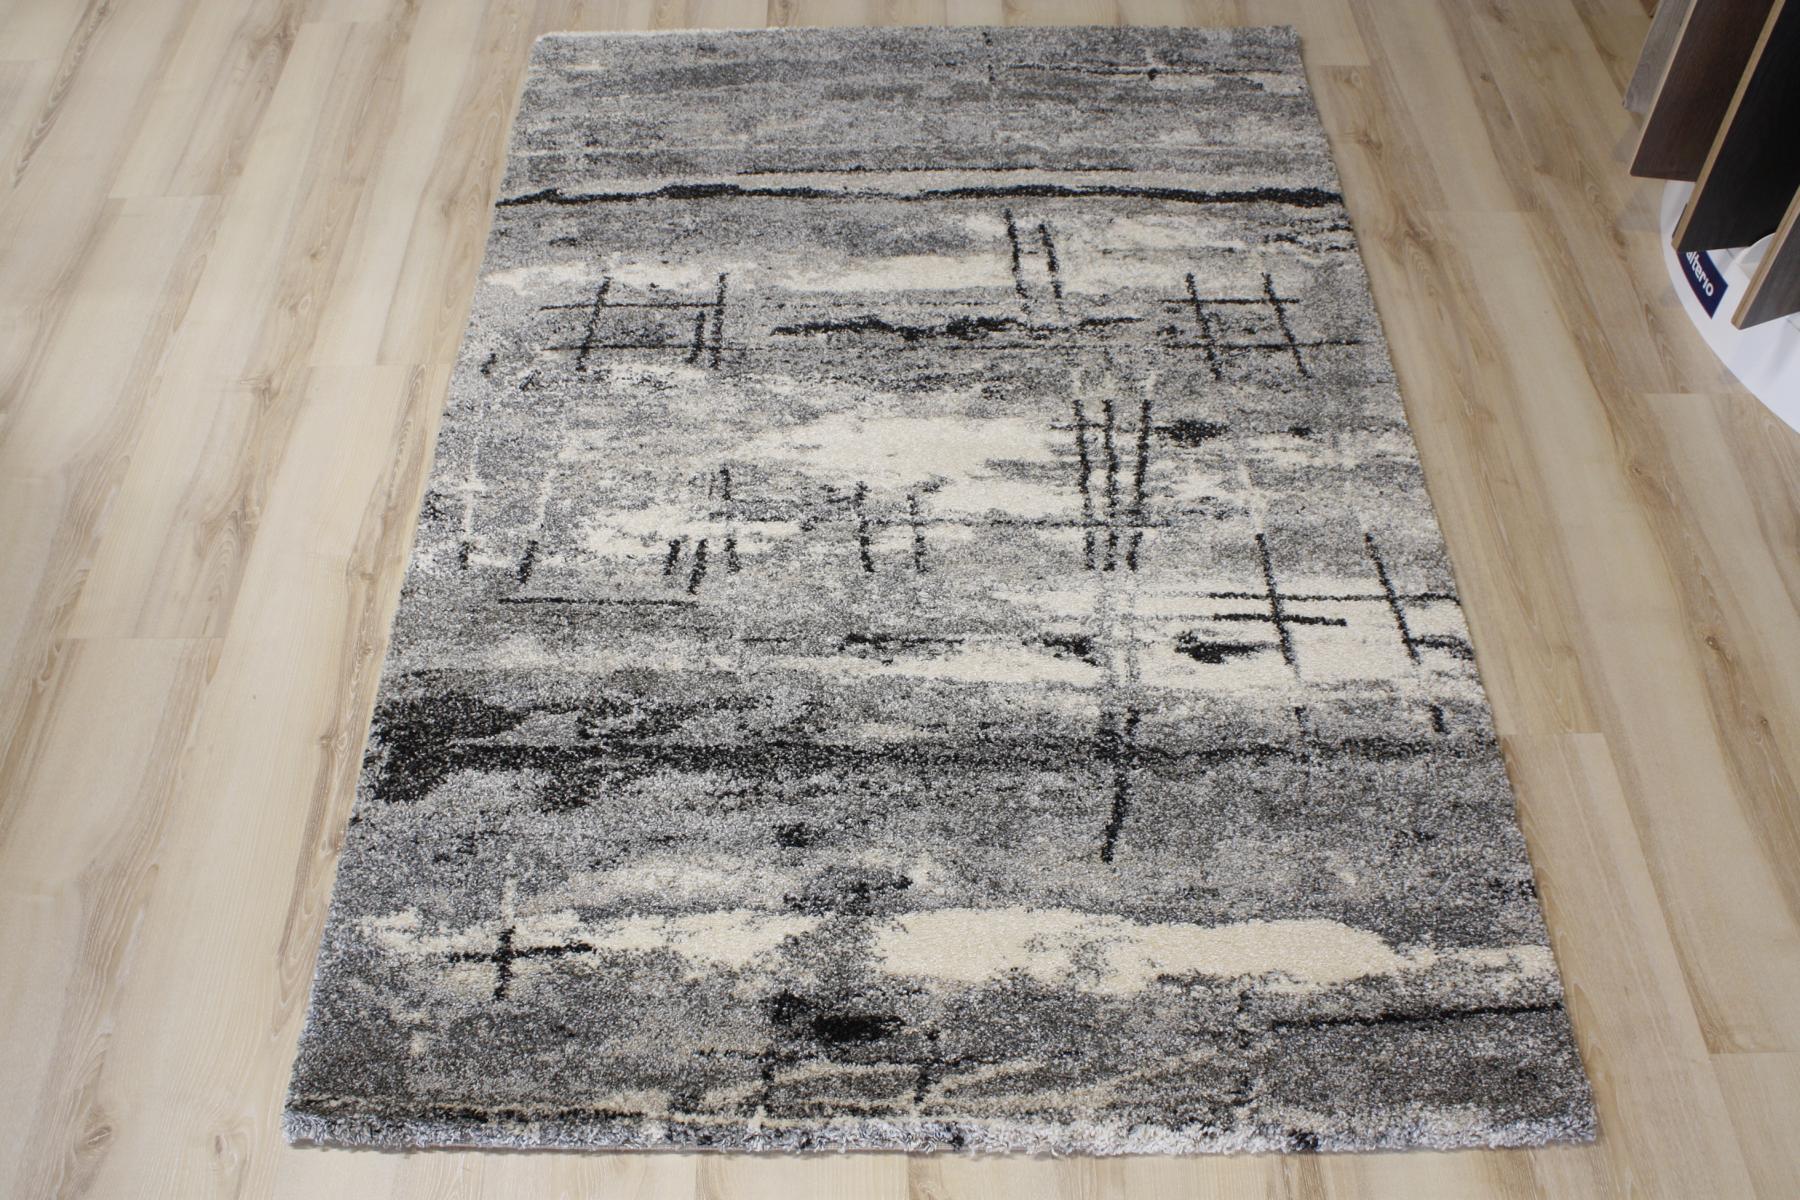 astra samoa teppich 6870 162 005 grau 240x300cm neu ebay. Black Bedroom Furniture Sets. Home Design Ideas